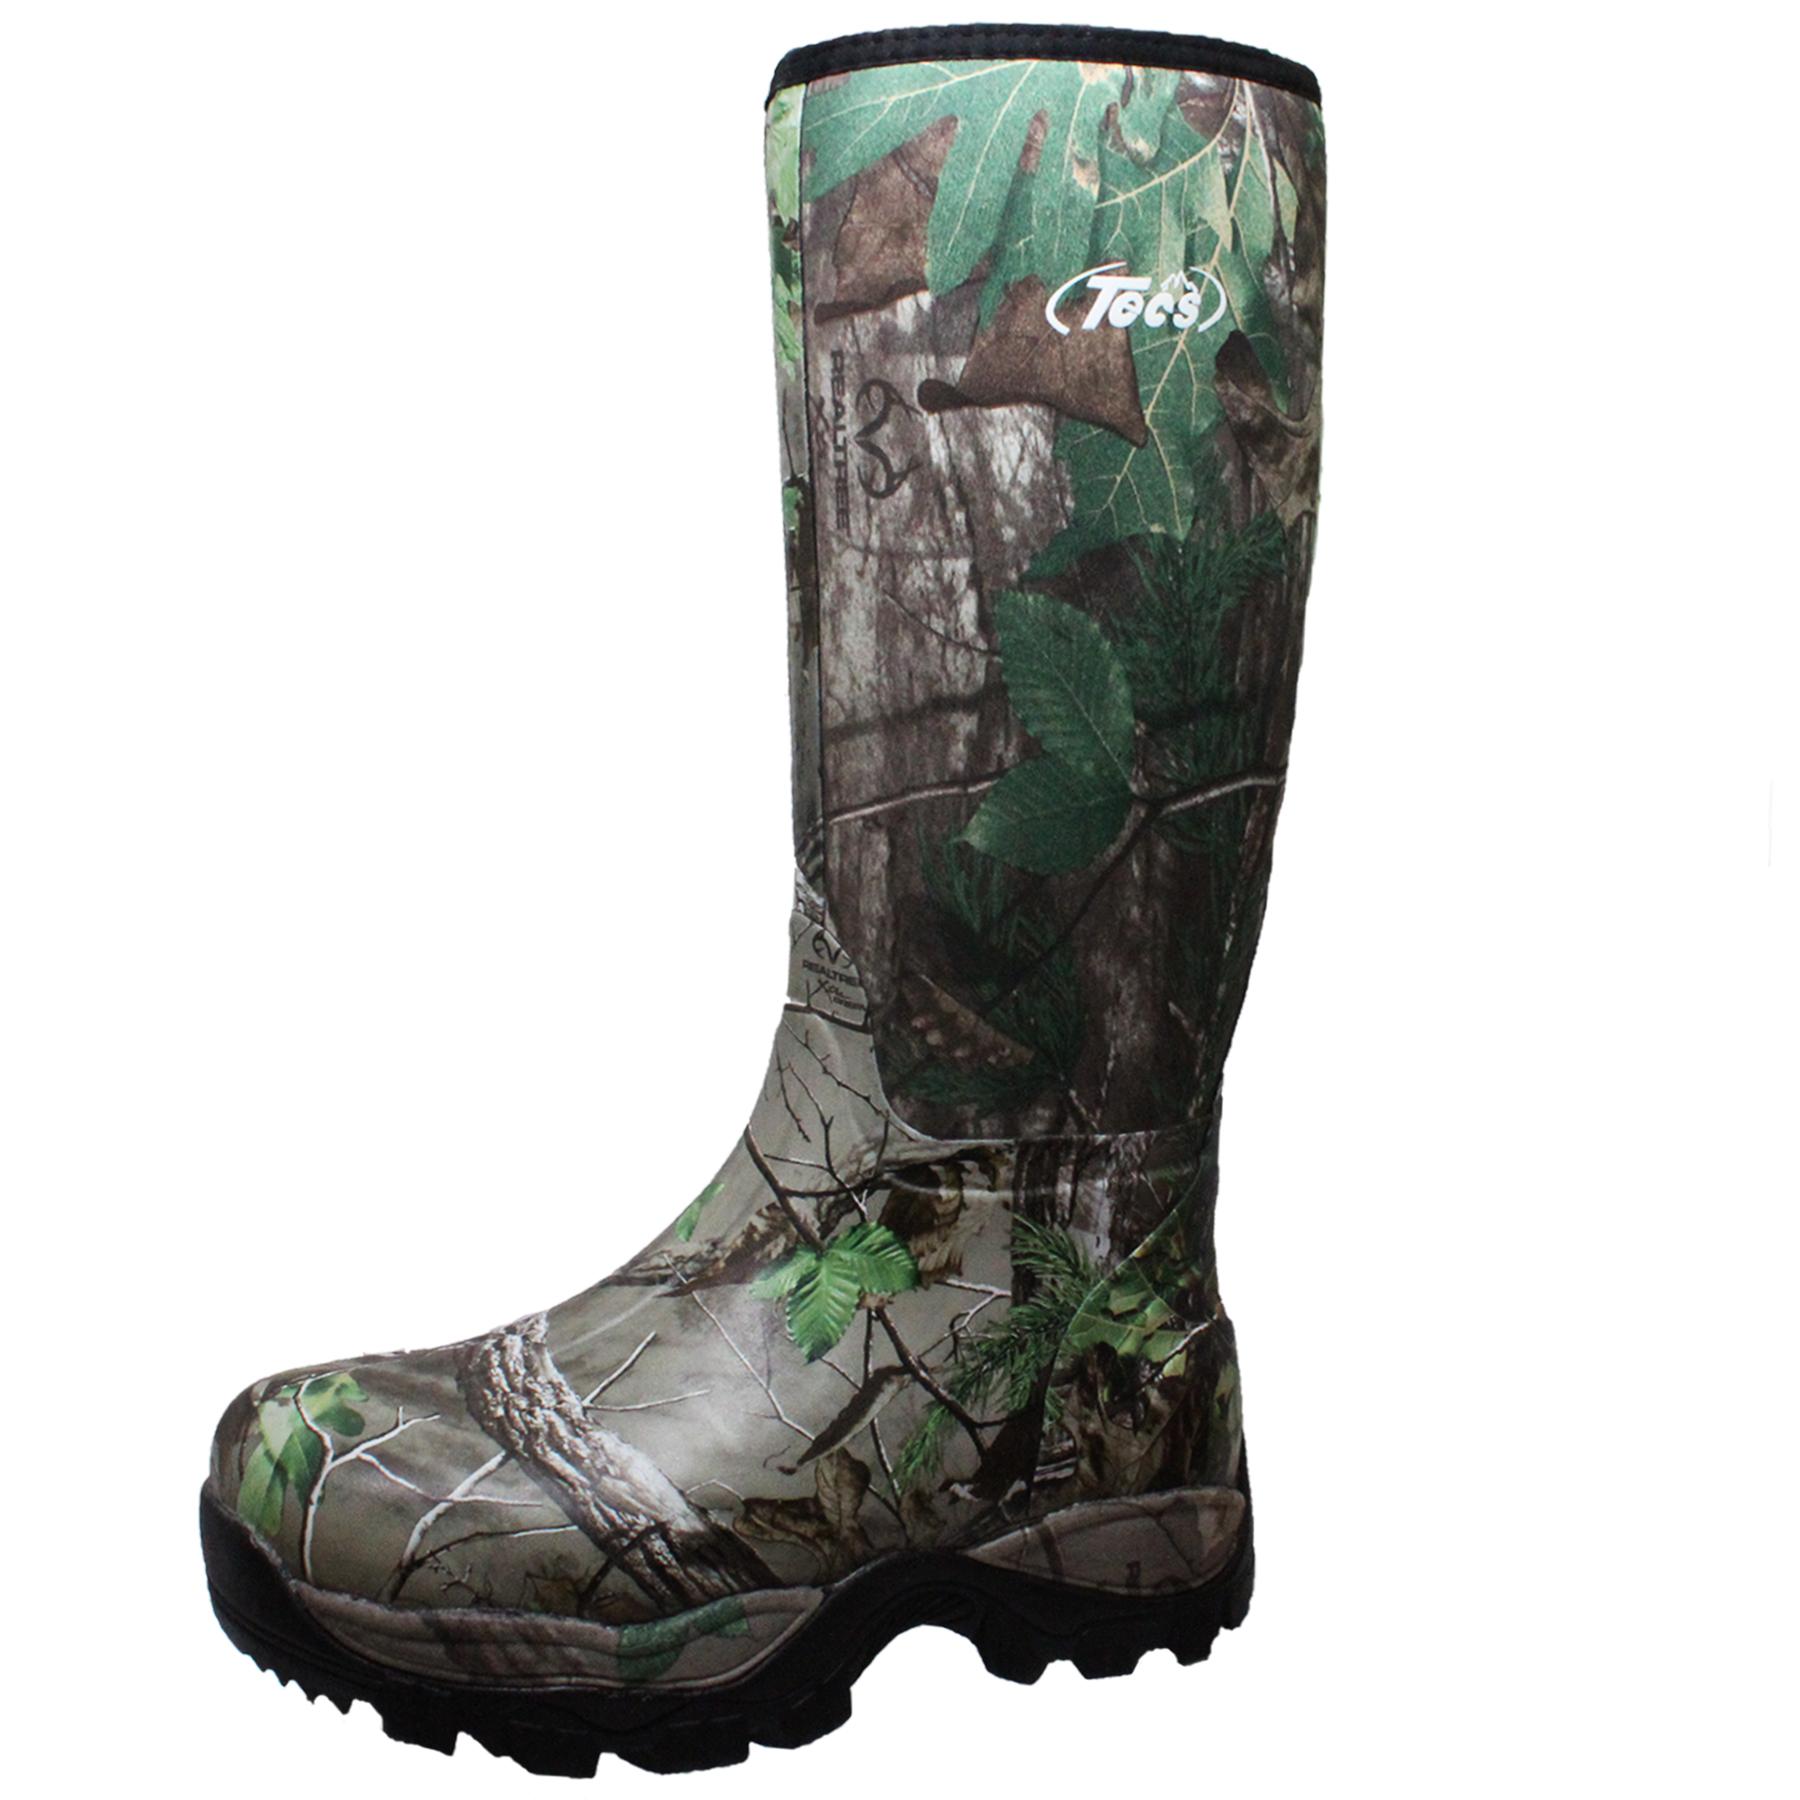 Tecs Mens 16 Waterproof Rubber Boot Camo